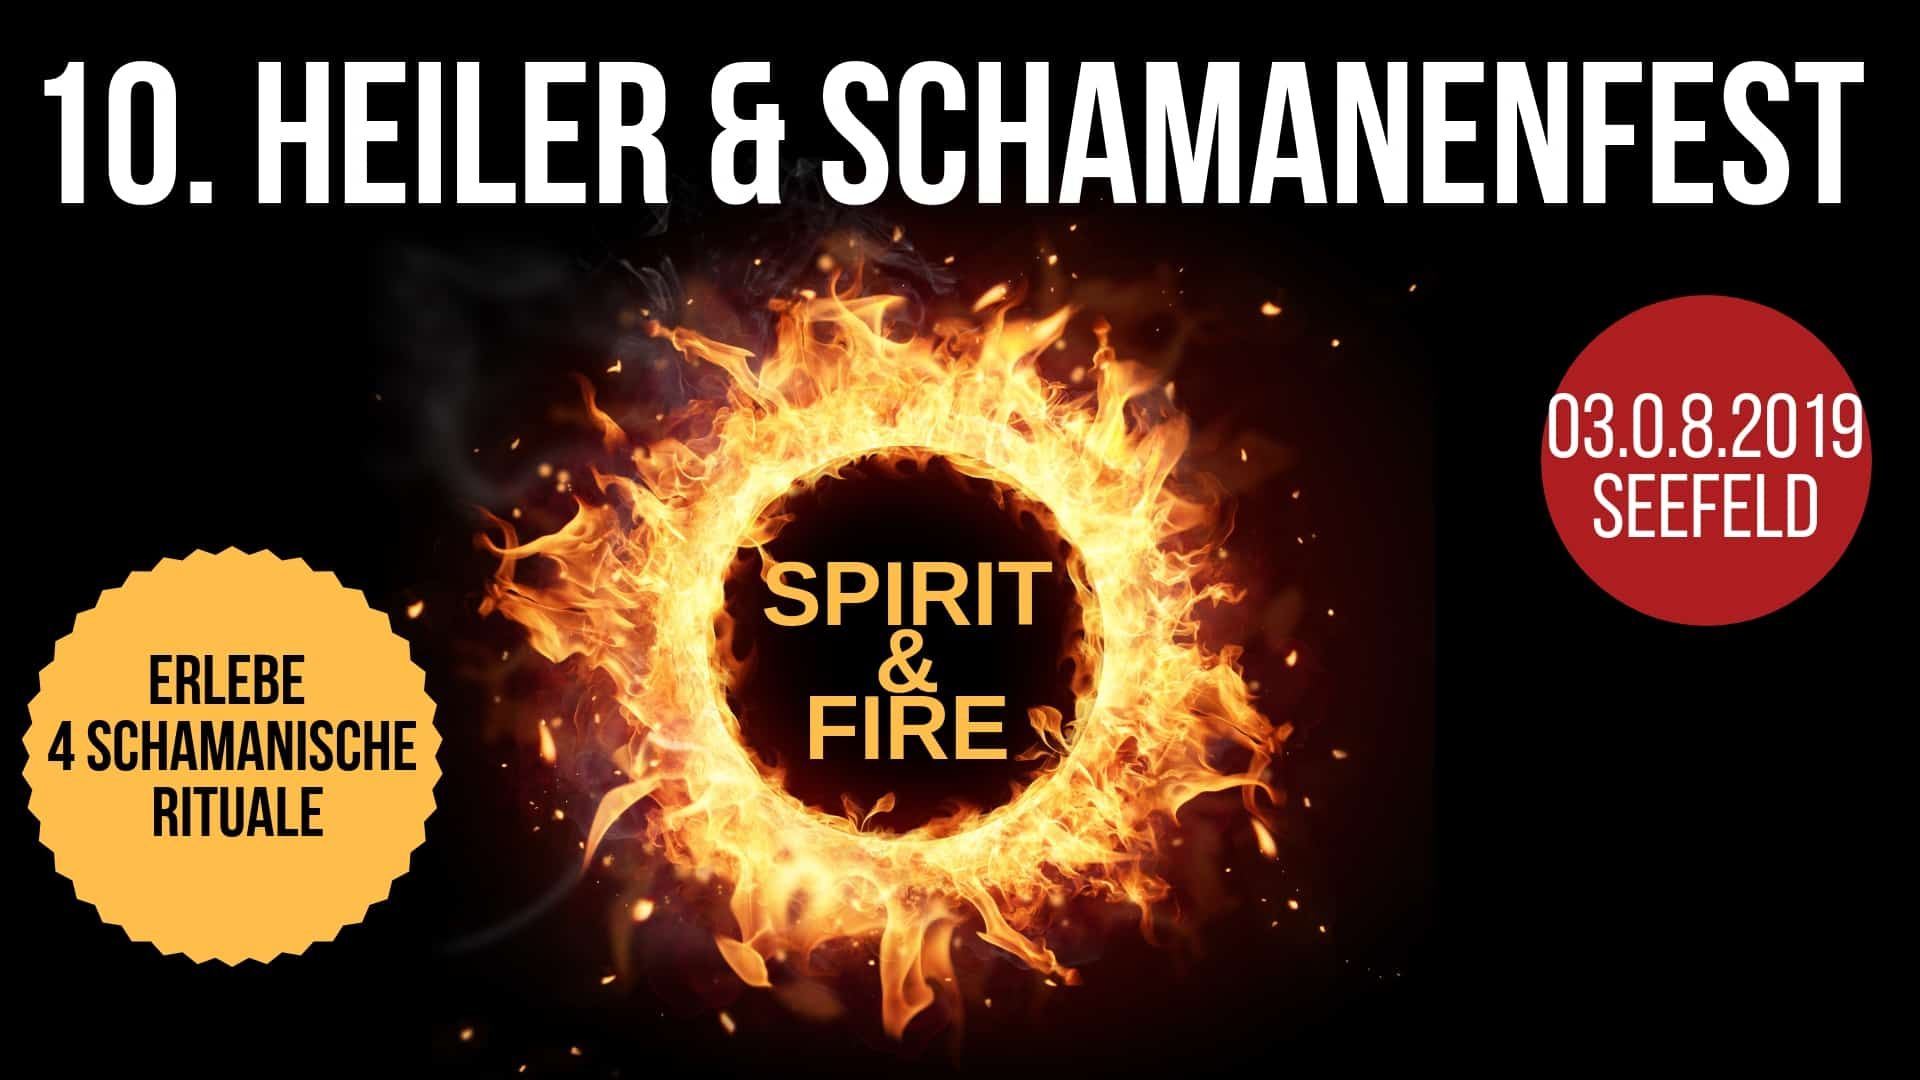 HEILER & SCHAMANENFEST SPIRIT & FIRE beim Ammersee am 03.08.2019